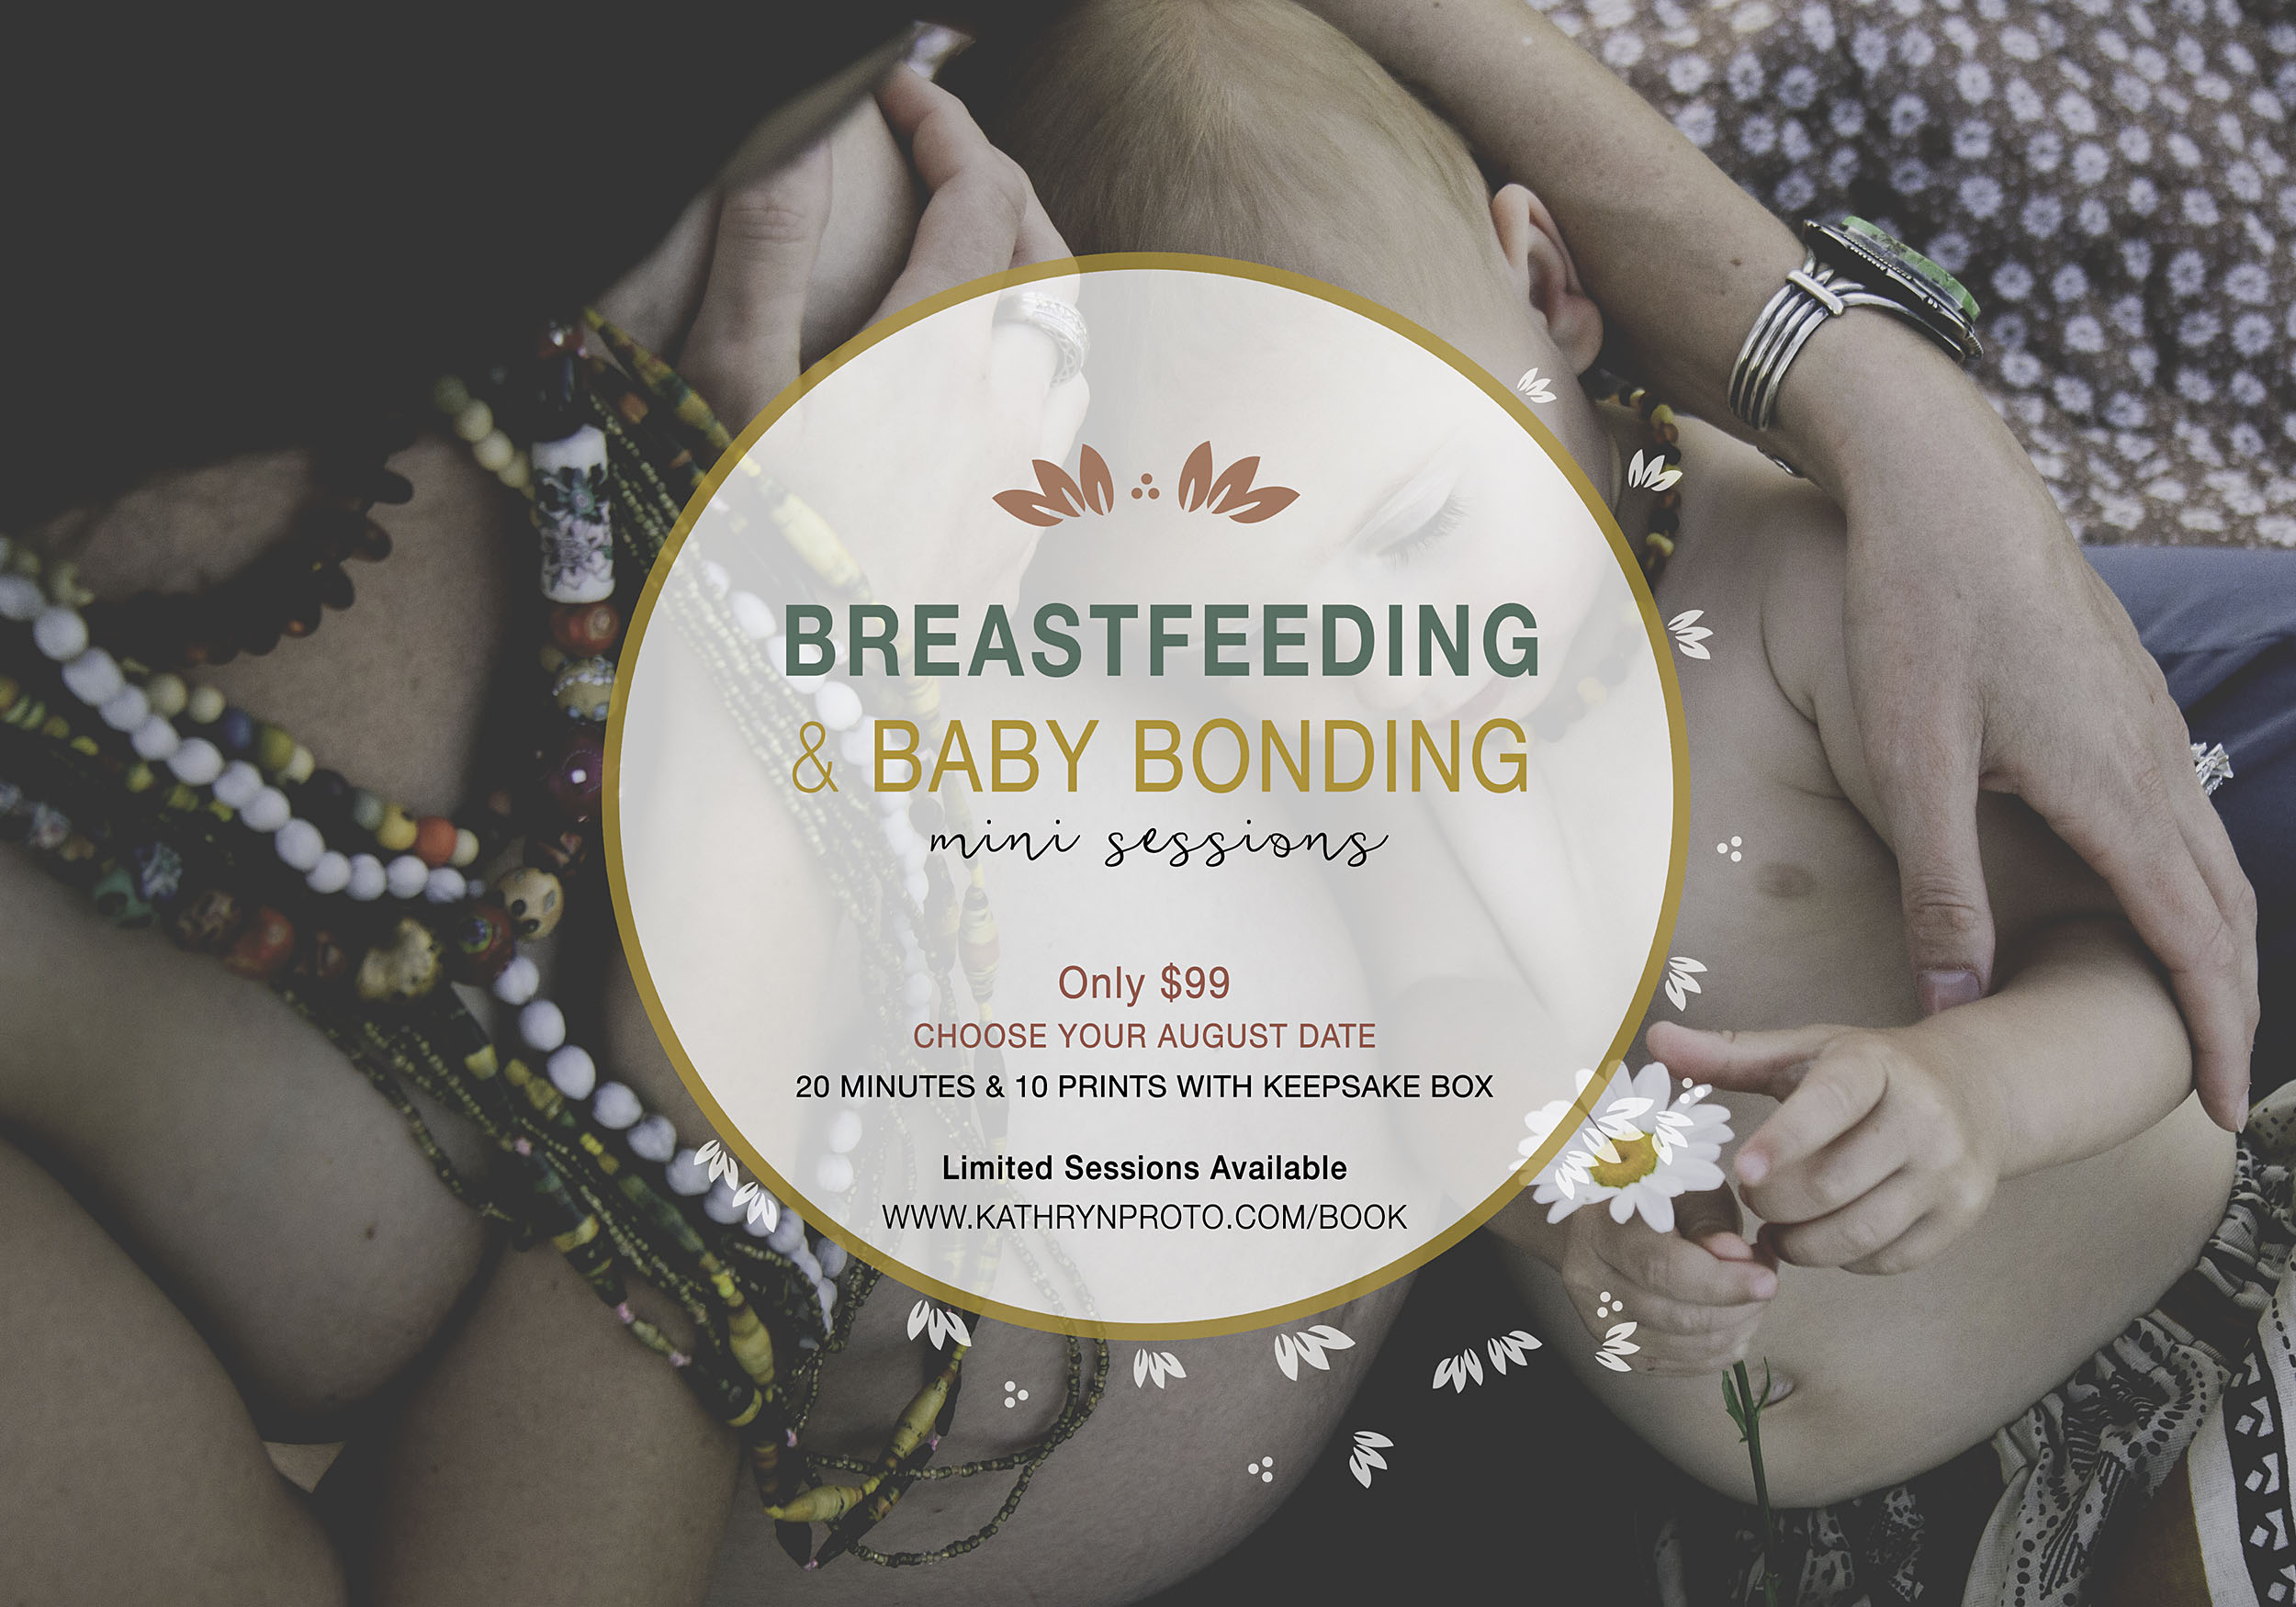 Kathryn Proto Photography: Breastfeeding Mini Session